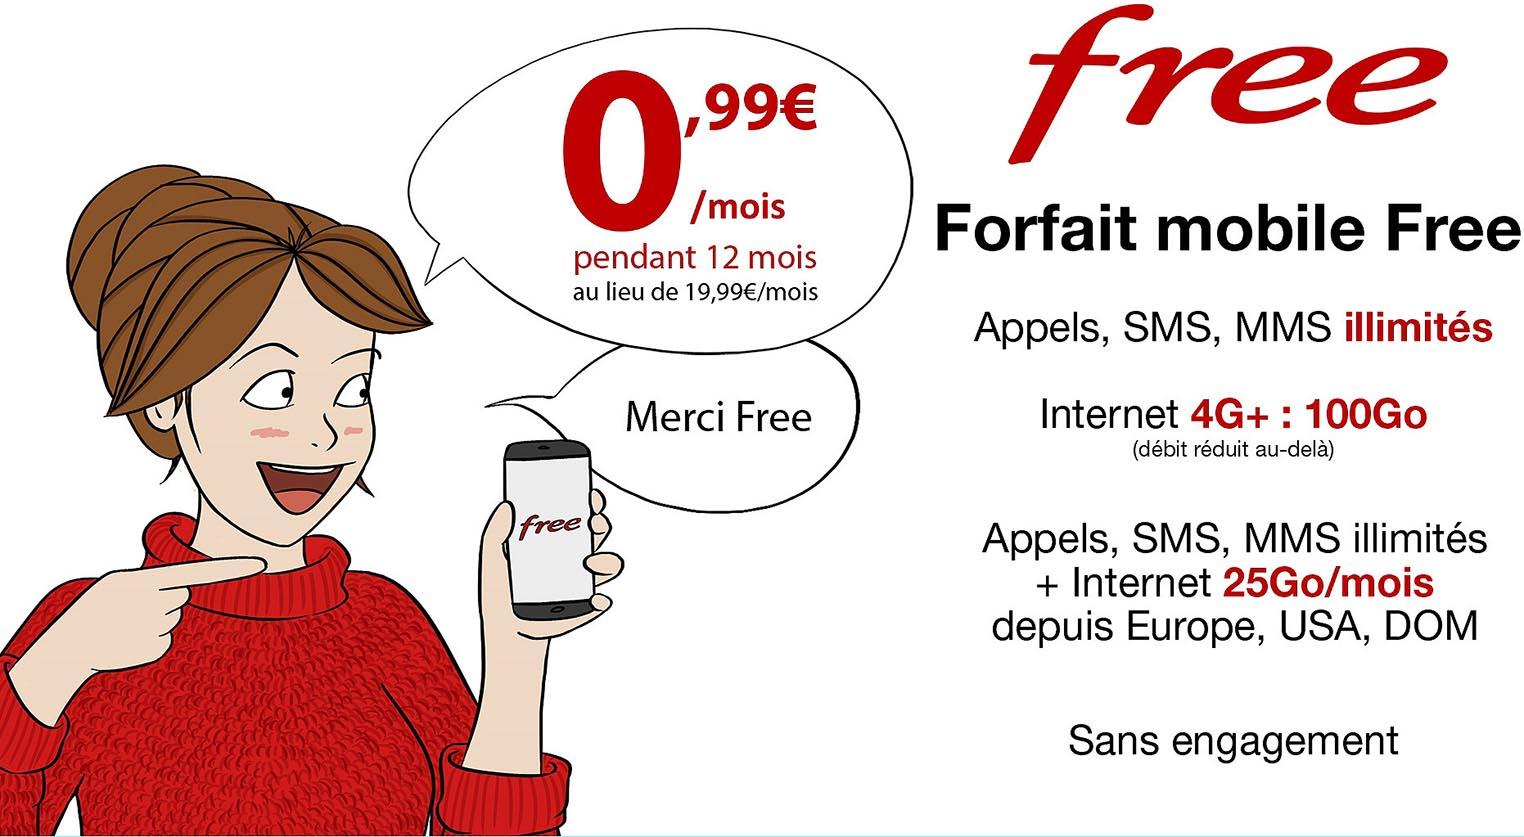 Free Mobile promo Vente Privée